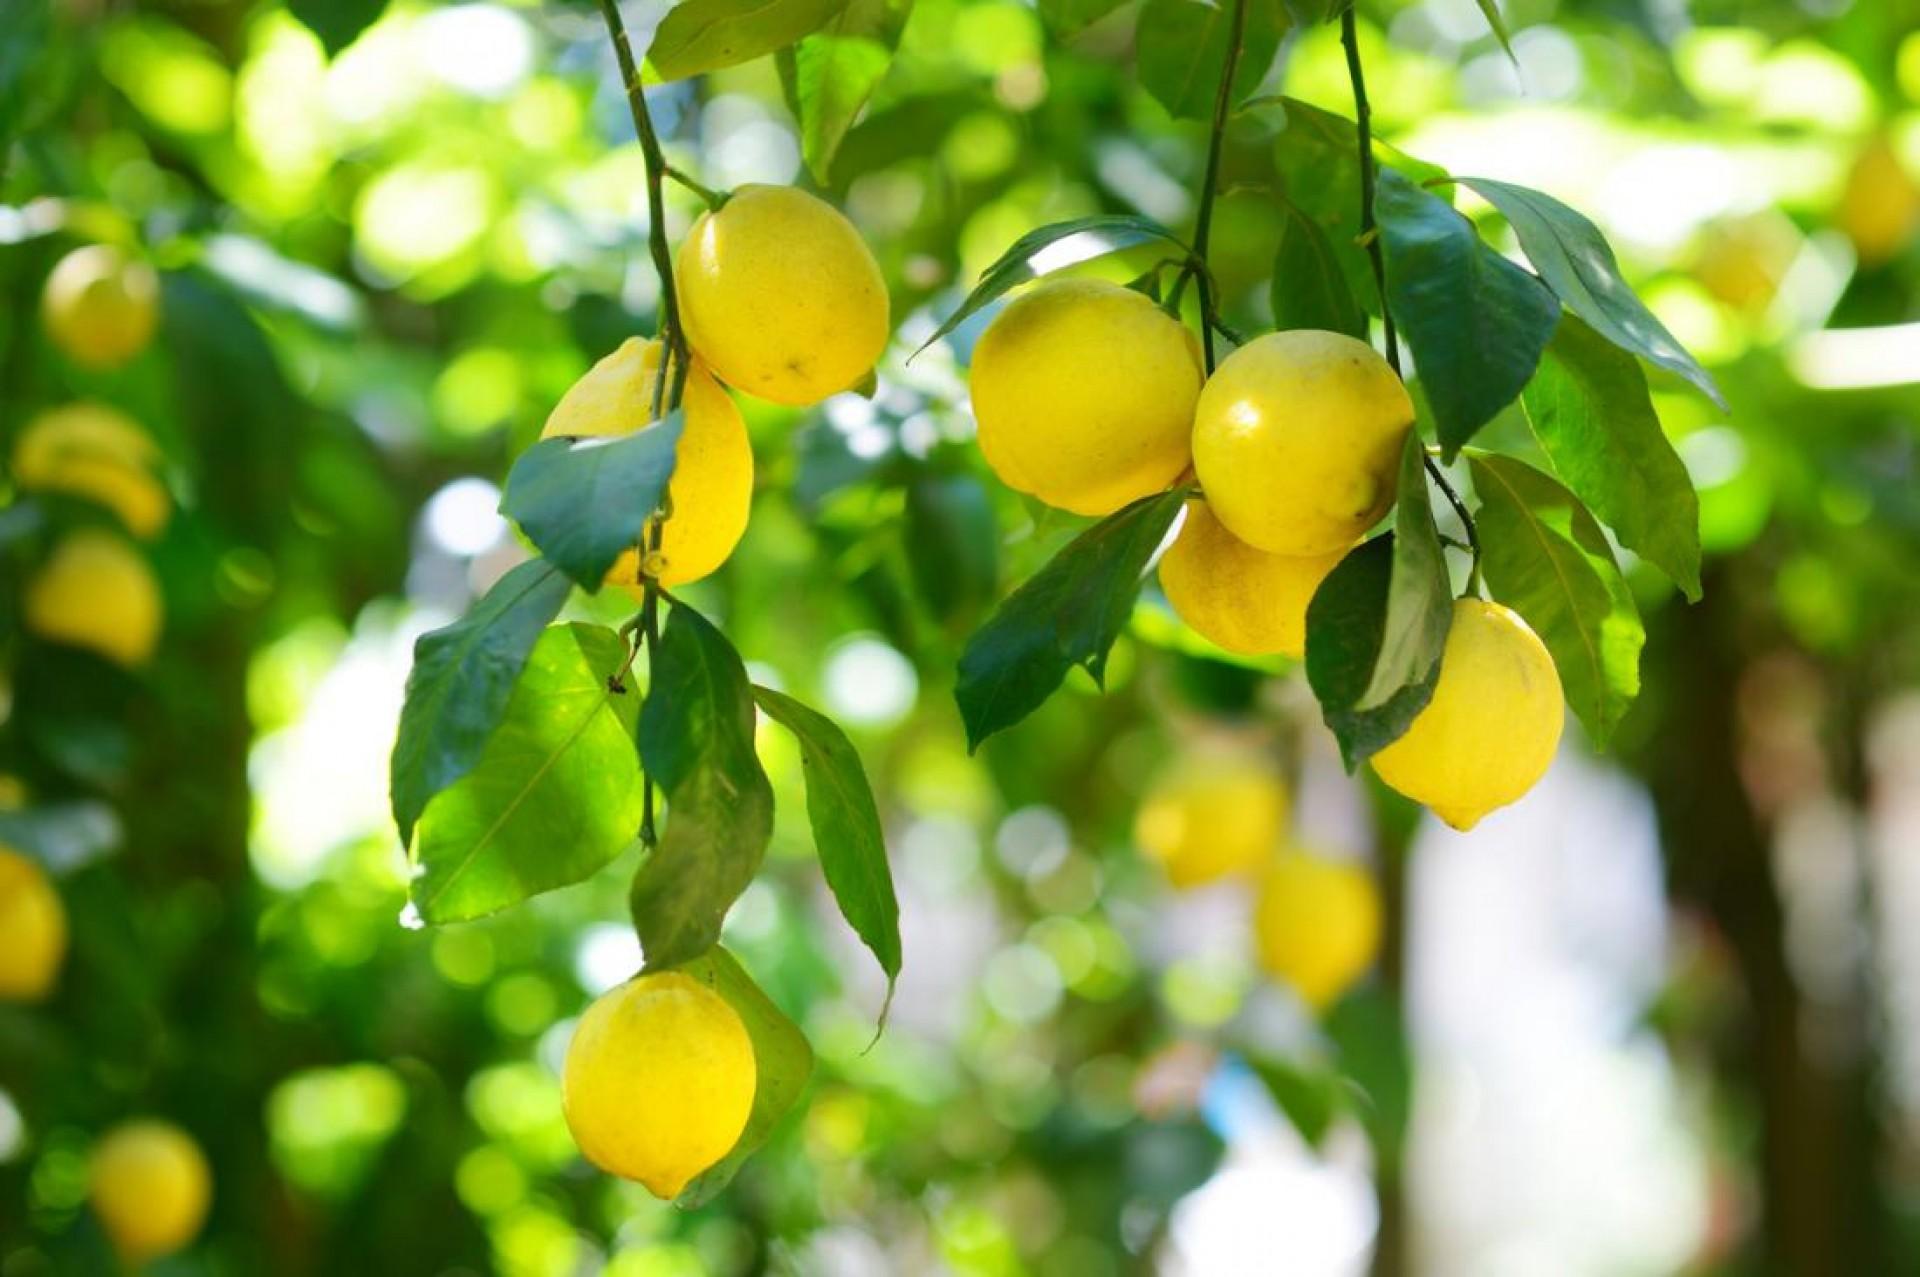 009 Essay Example Lemons Lemon Unusual Clot Reddit 1920